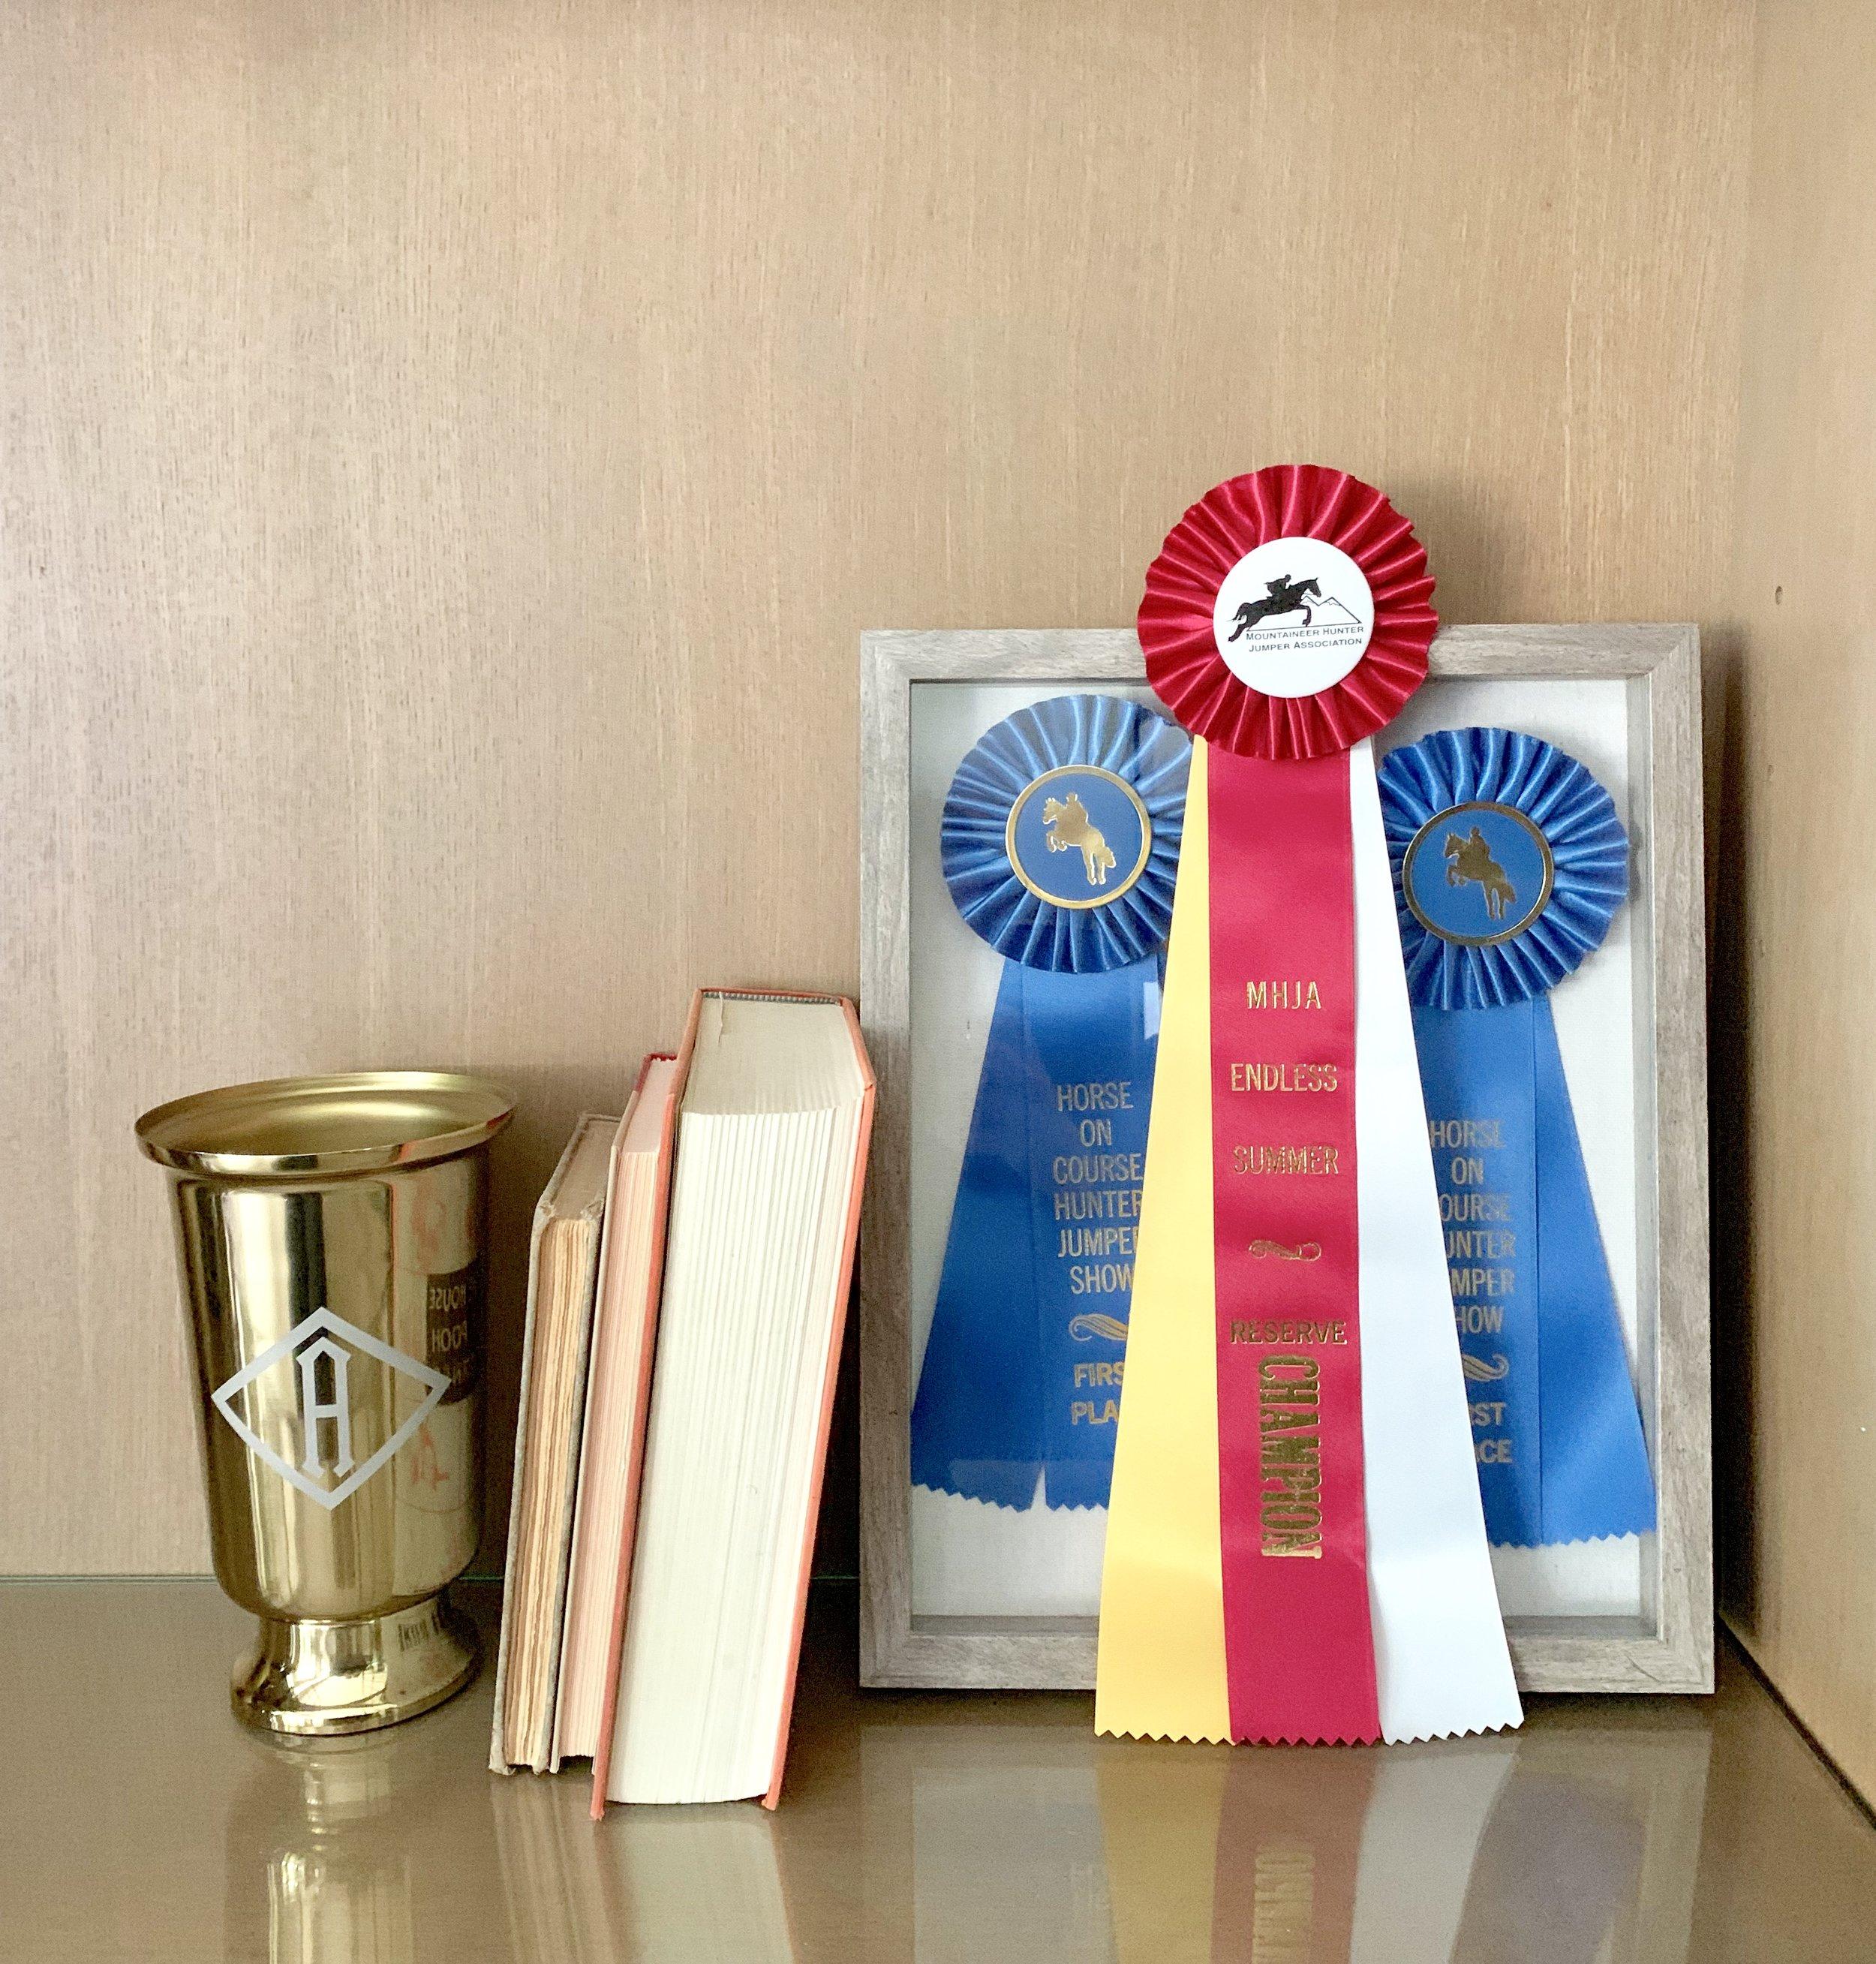 Monogrammed vase shelf décor featuring Ballard Designs Amelia Vase. Farmhouse Redefined.